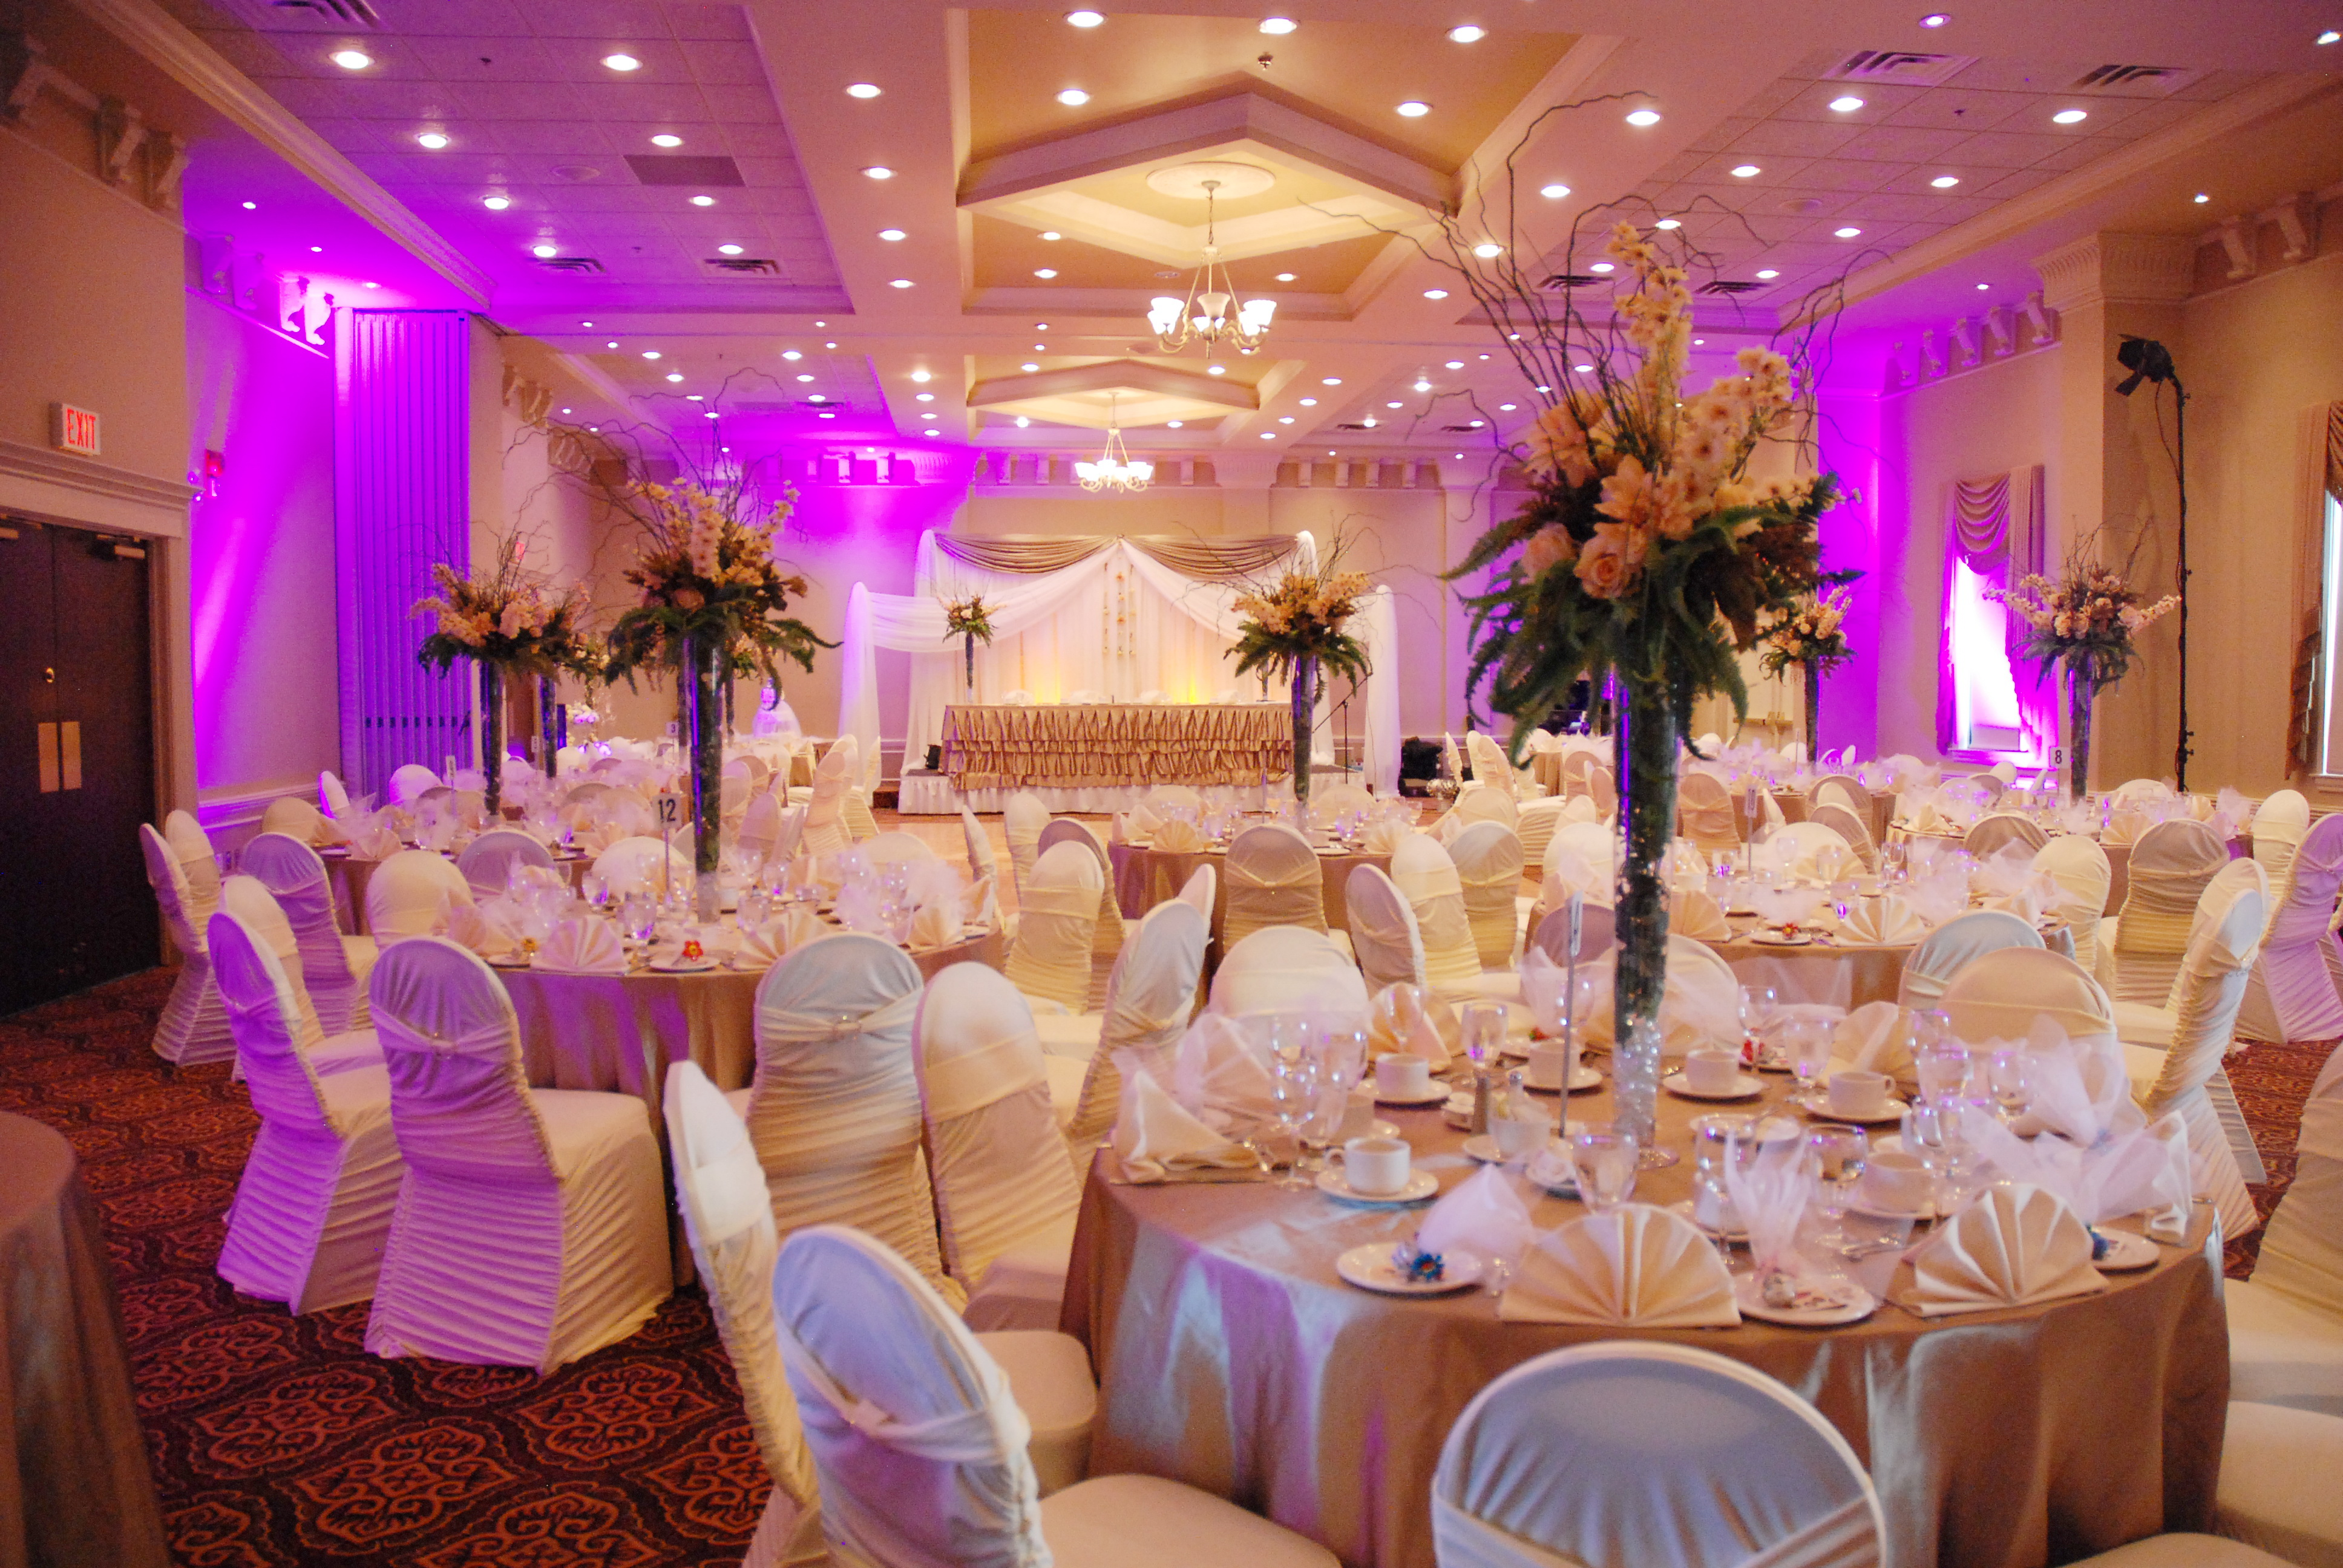 59 - Summer Weddings | Wedding & Event Decor Rentals Calgary ...